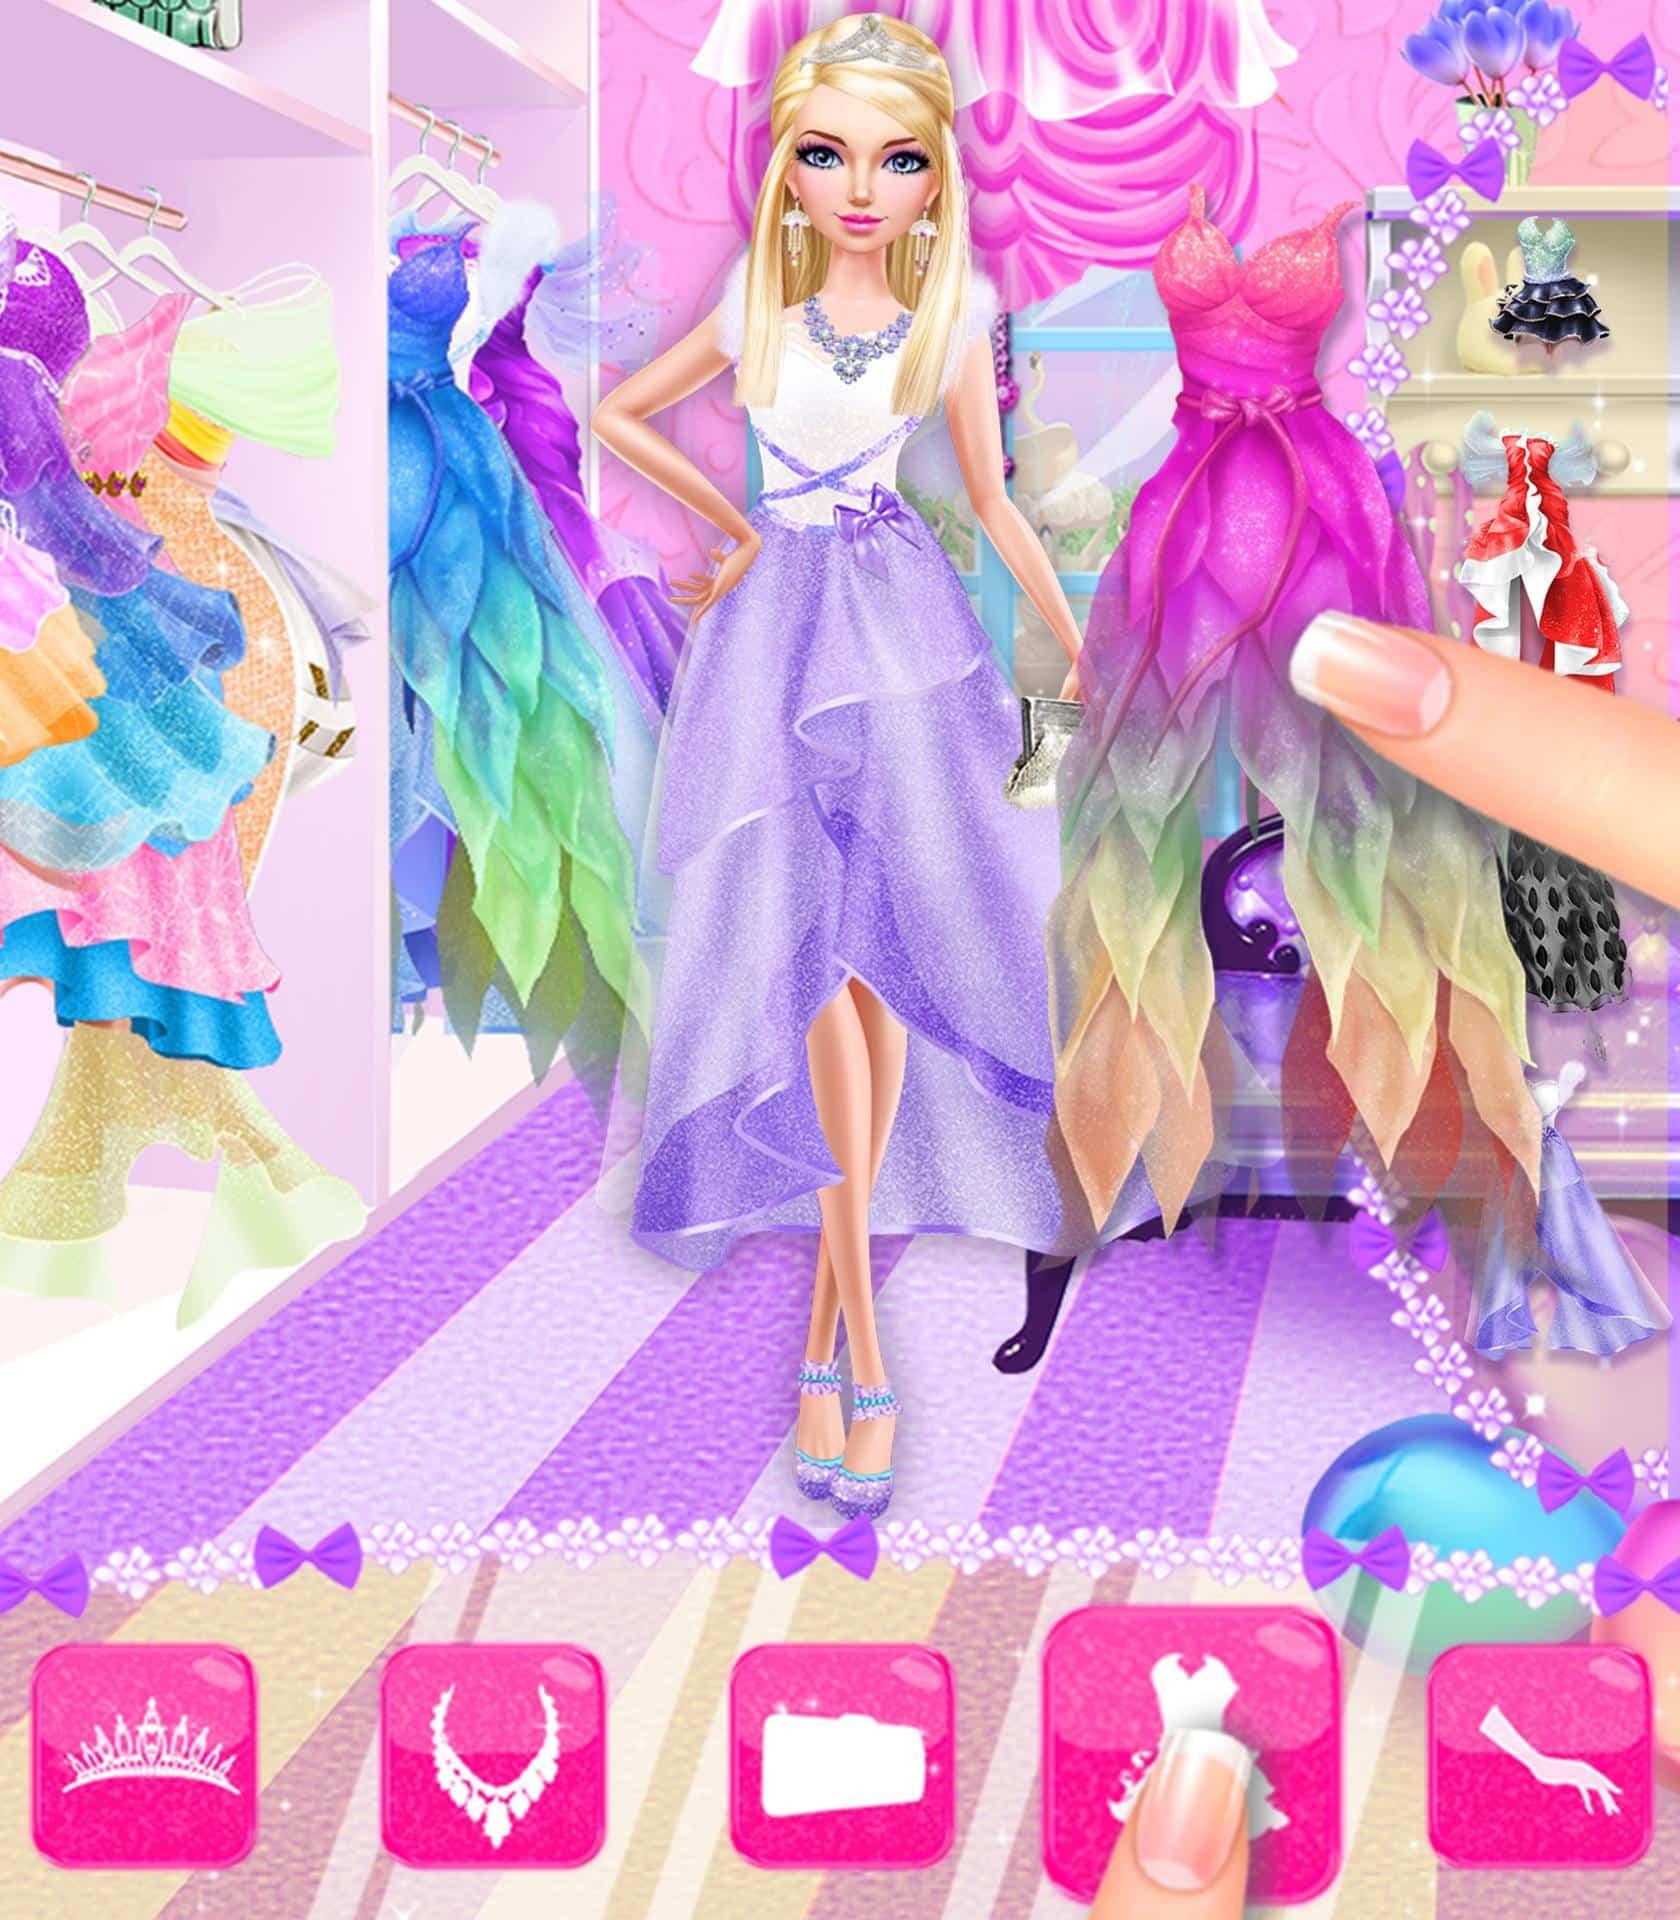 Princess-Prom-Night-Dress-Up